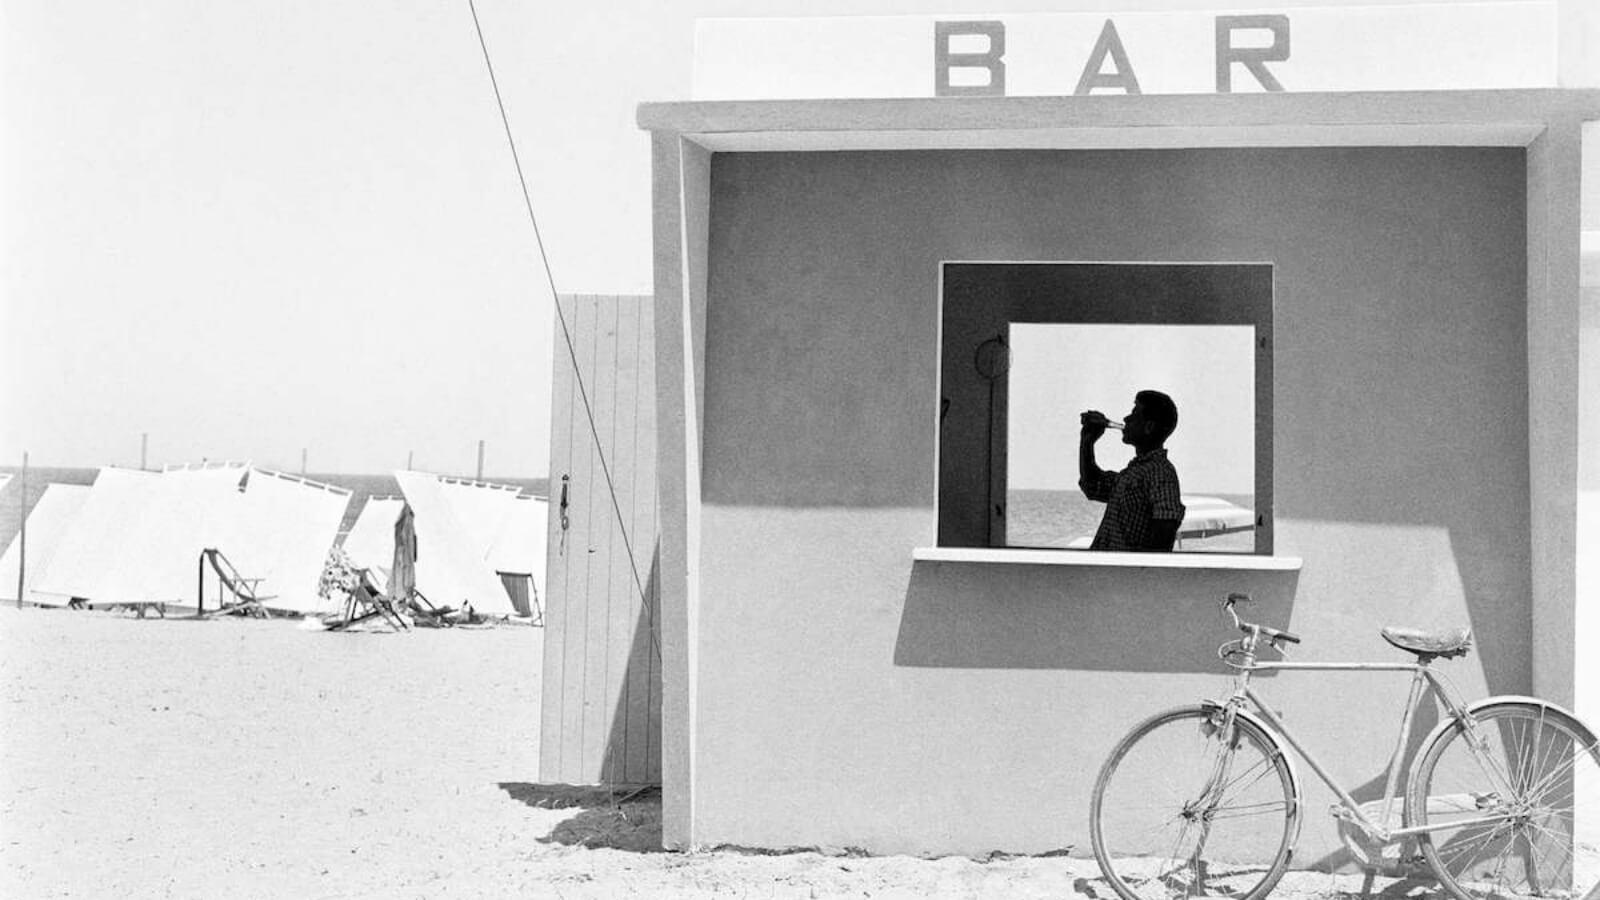 El foto periodismo de posguerra de Piergiorgio Branzi